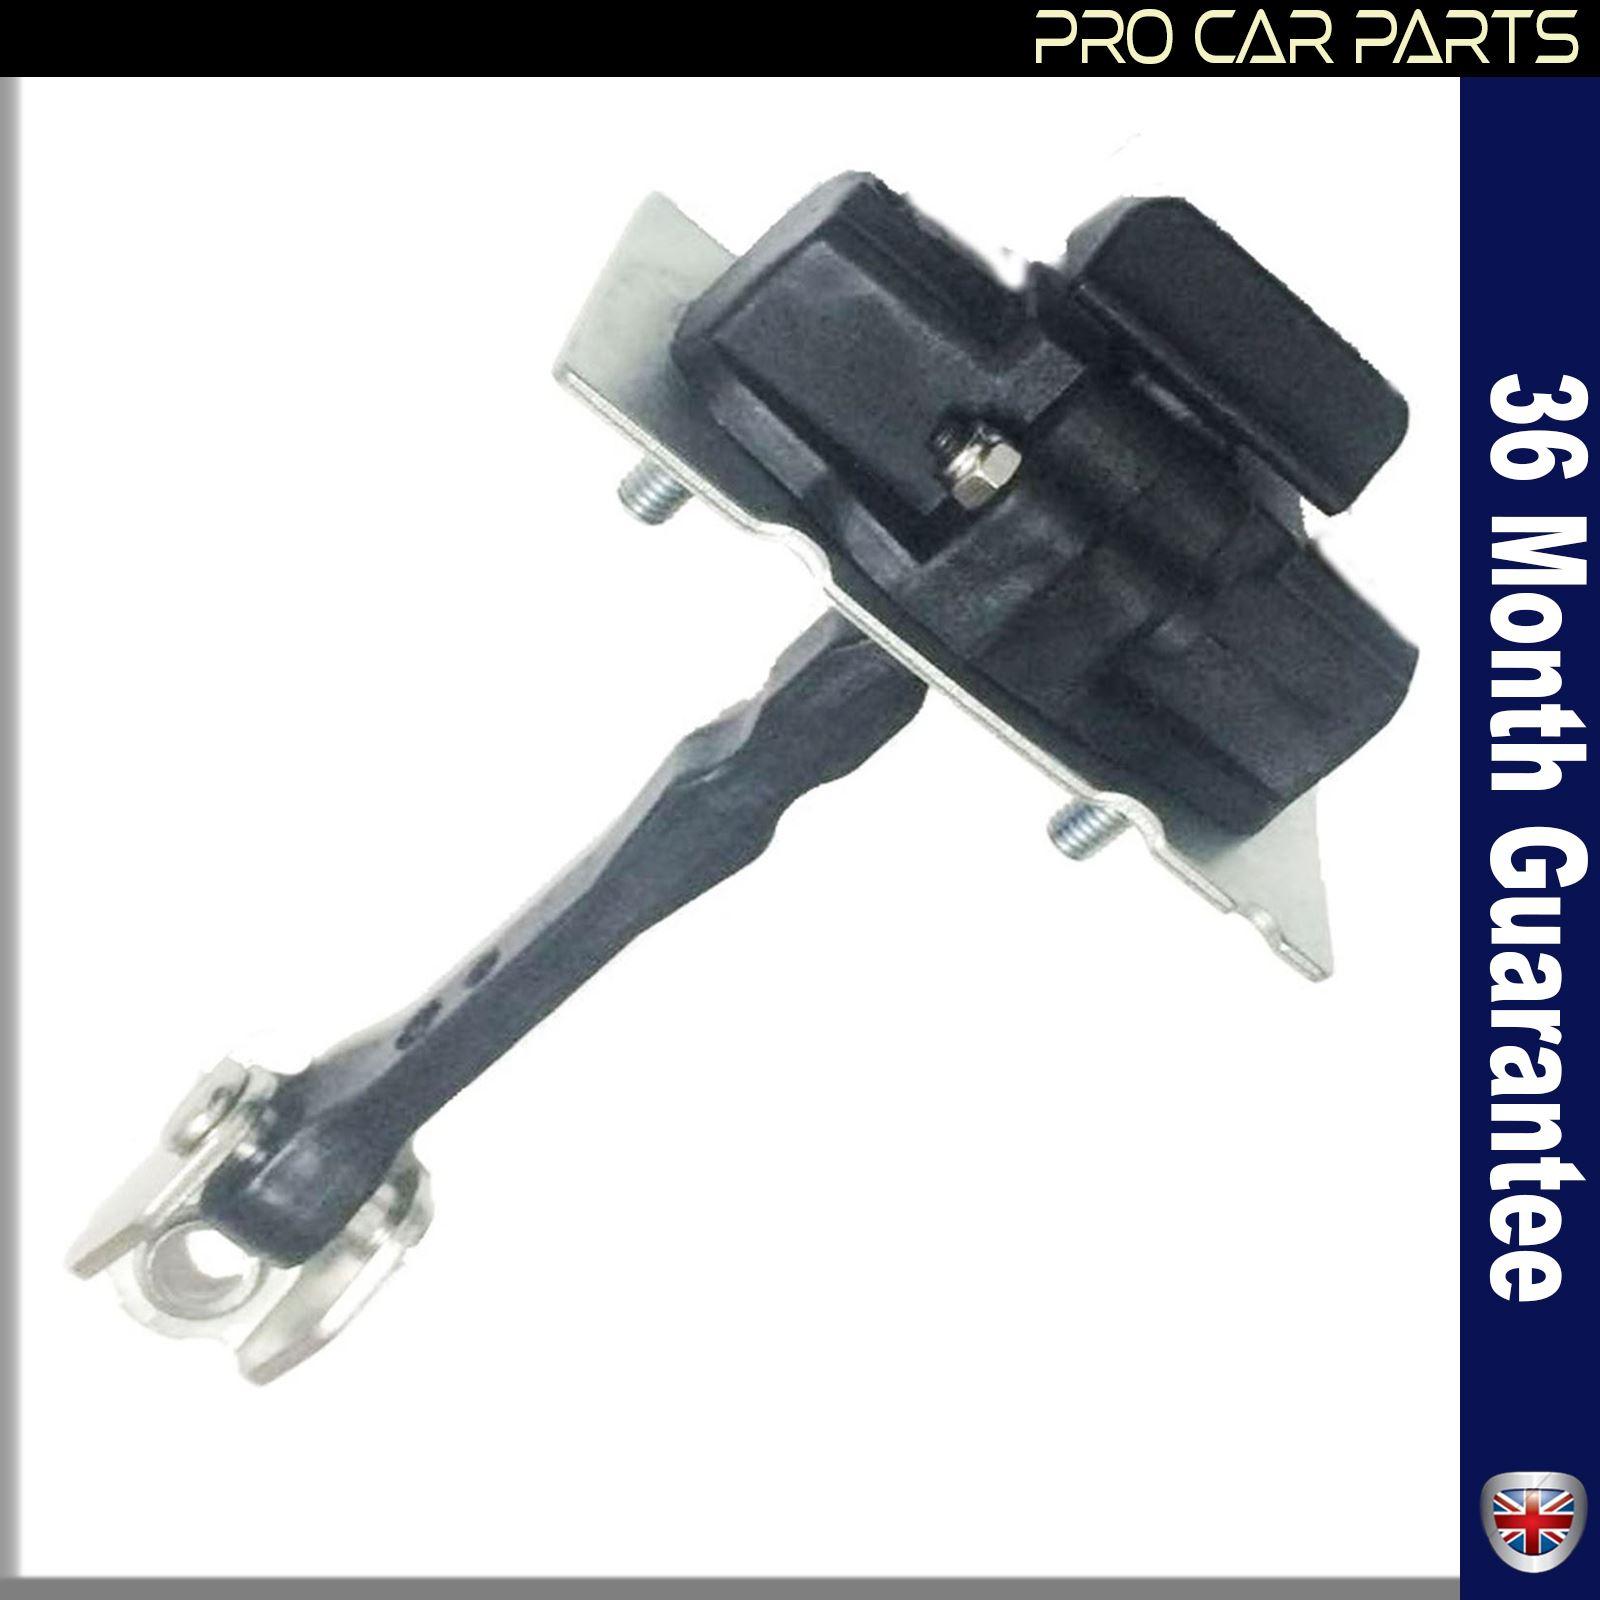 Front Door Check Asss Strap Hinge Stopper FOR PEUGEOT 308 MK 2 SW MK2 9677466980